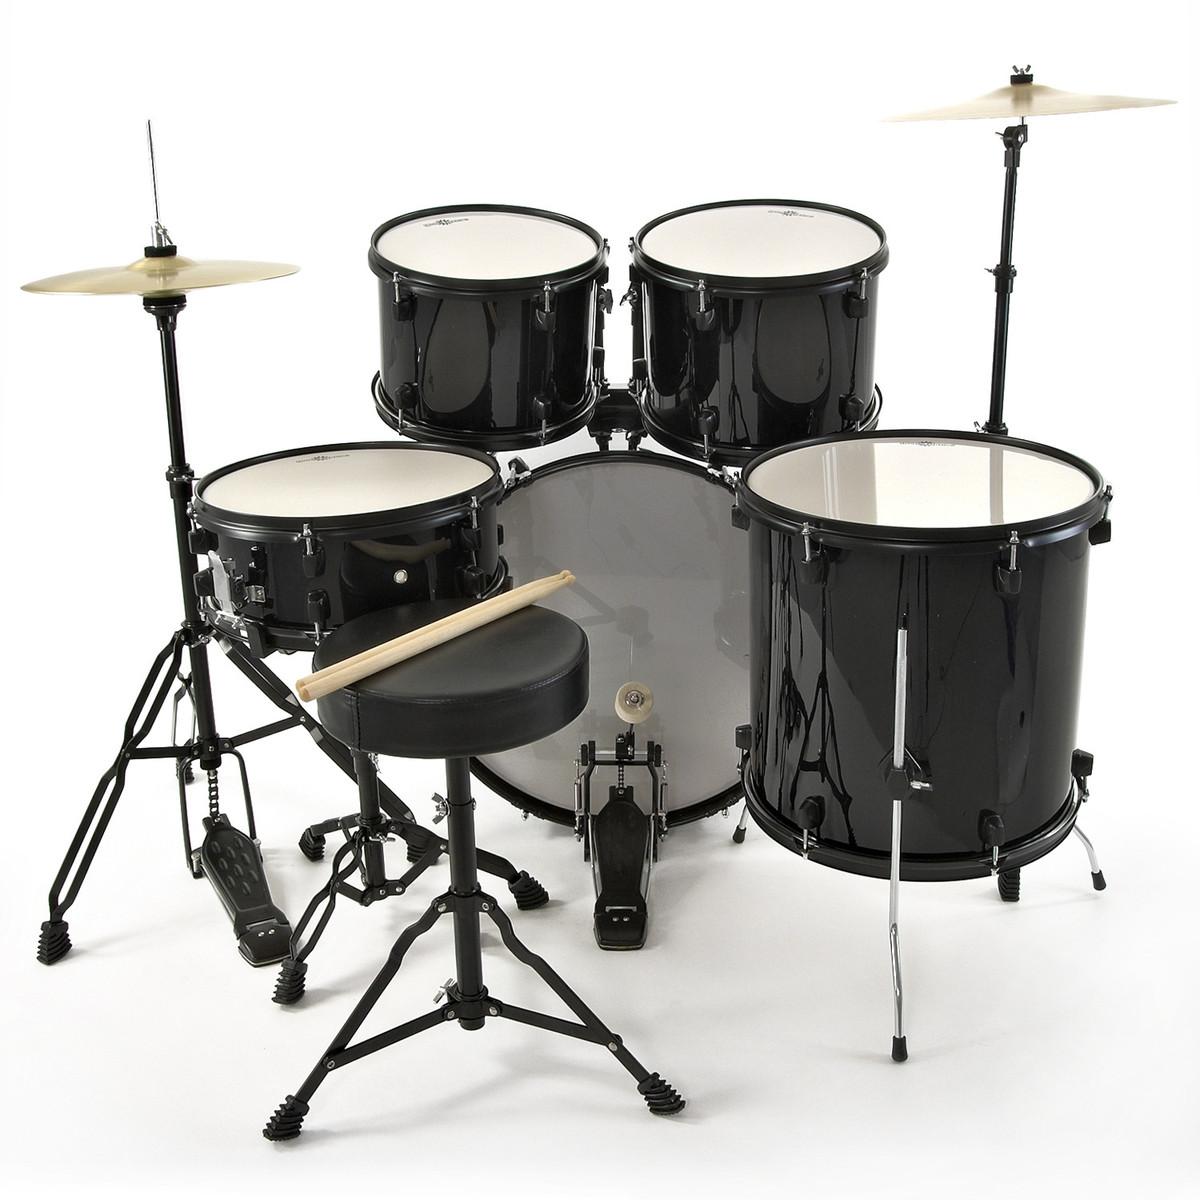 bdk 1 full size starter drum kit by gear4music black b stock at. Black Bedroom Furniture Sets. Home Design Ideas